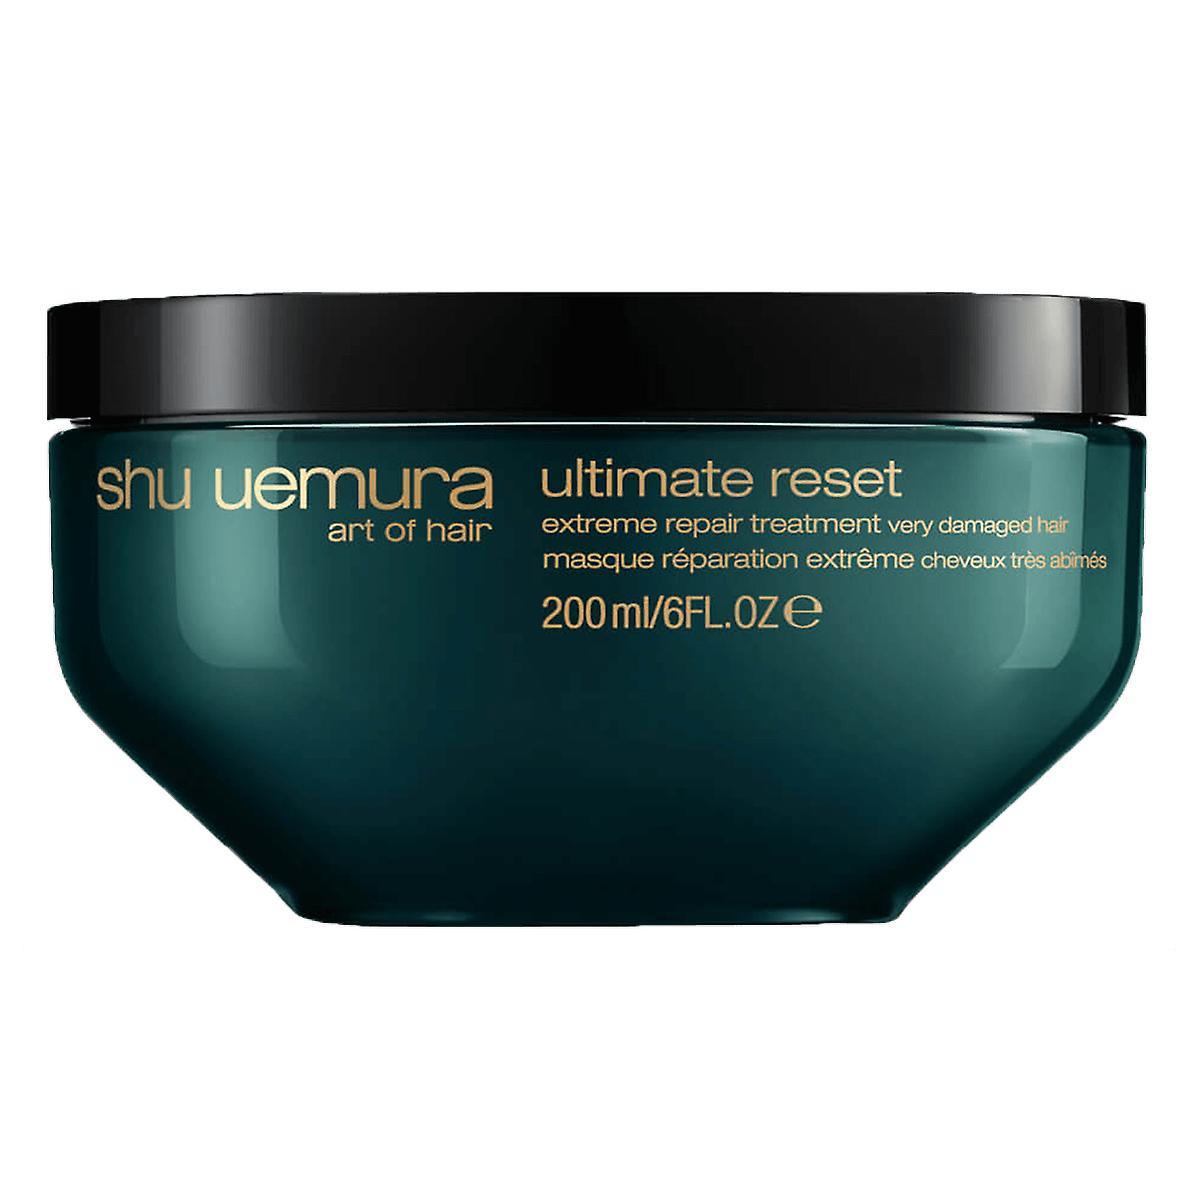 Shu Uemura Ultimate Reset Extreme Repair Treatment 200ml